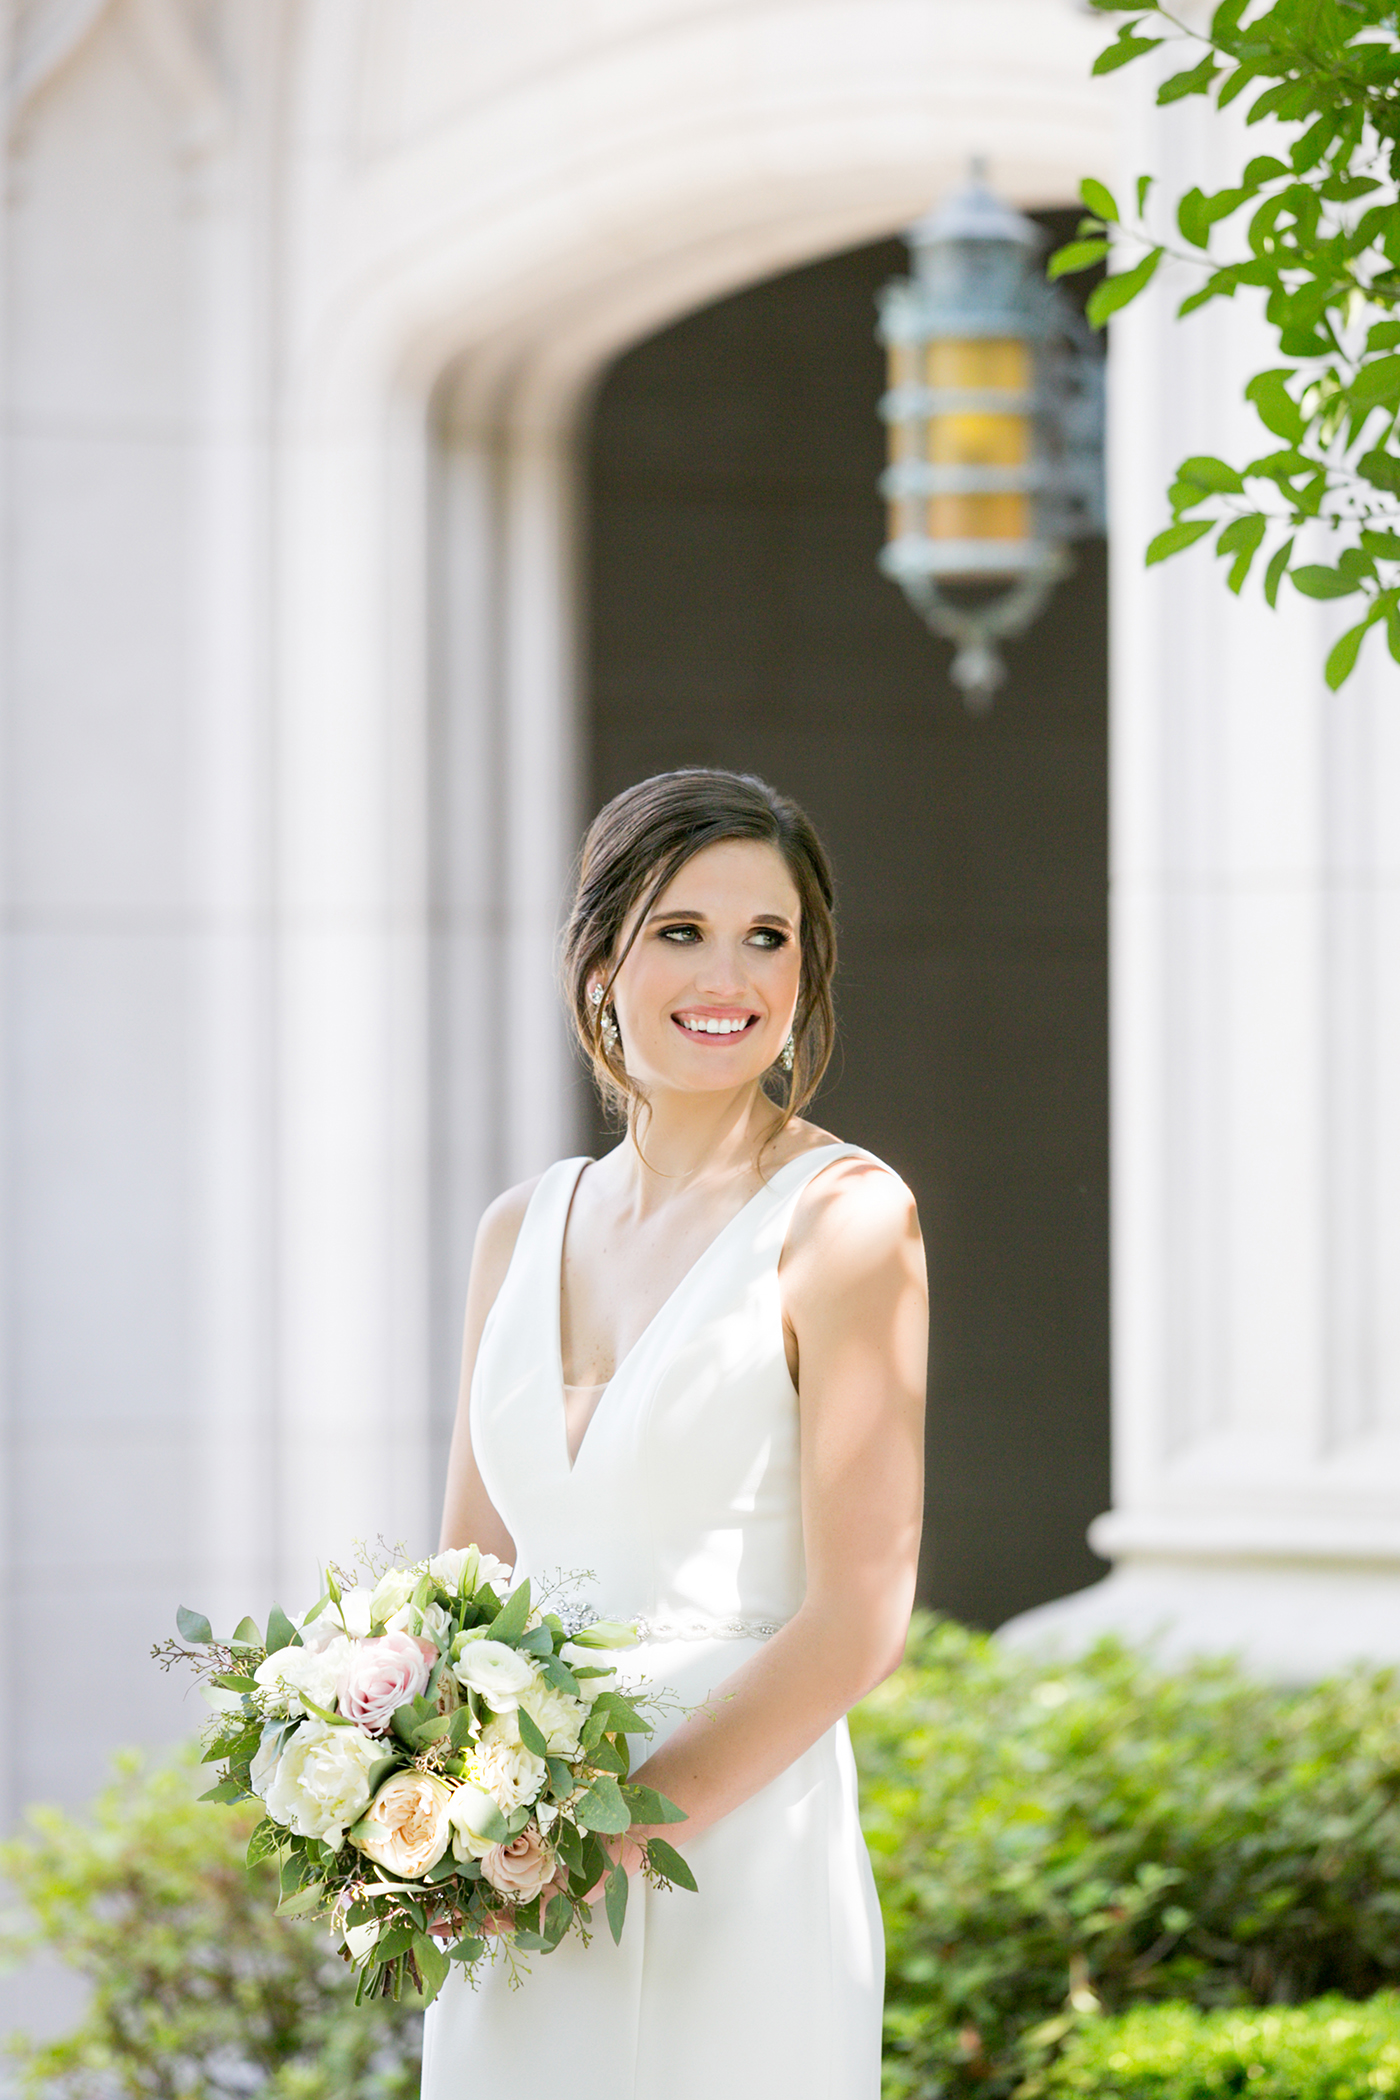 Wedding Planner Dallas TX - Allday Events - Highland Park - Marie Gabrielle Wedding - 193.jpg